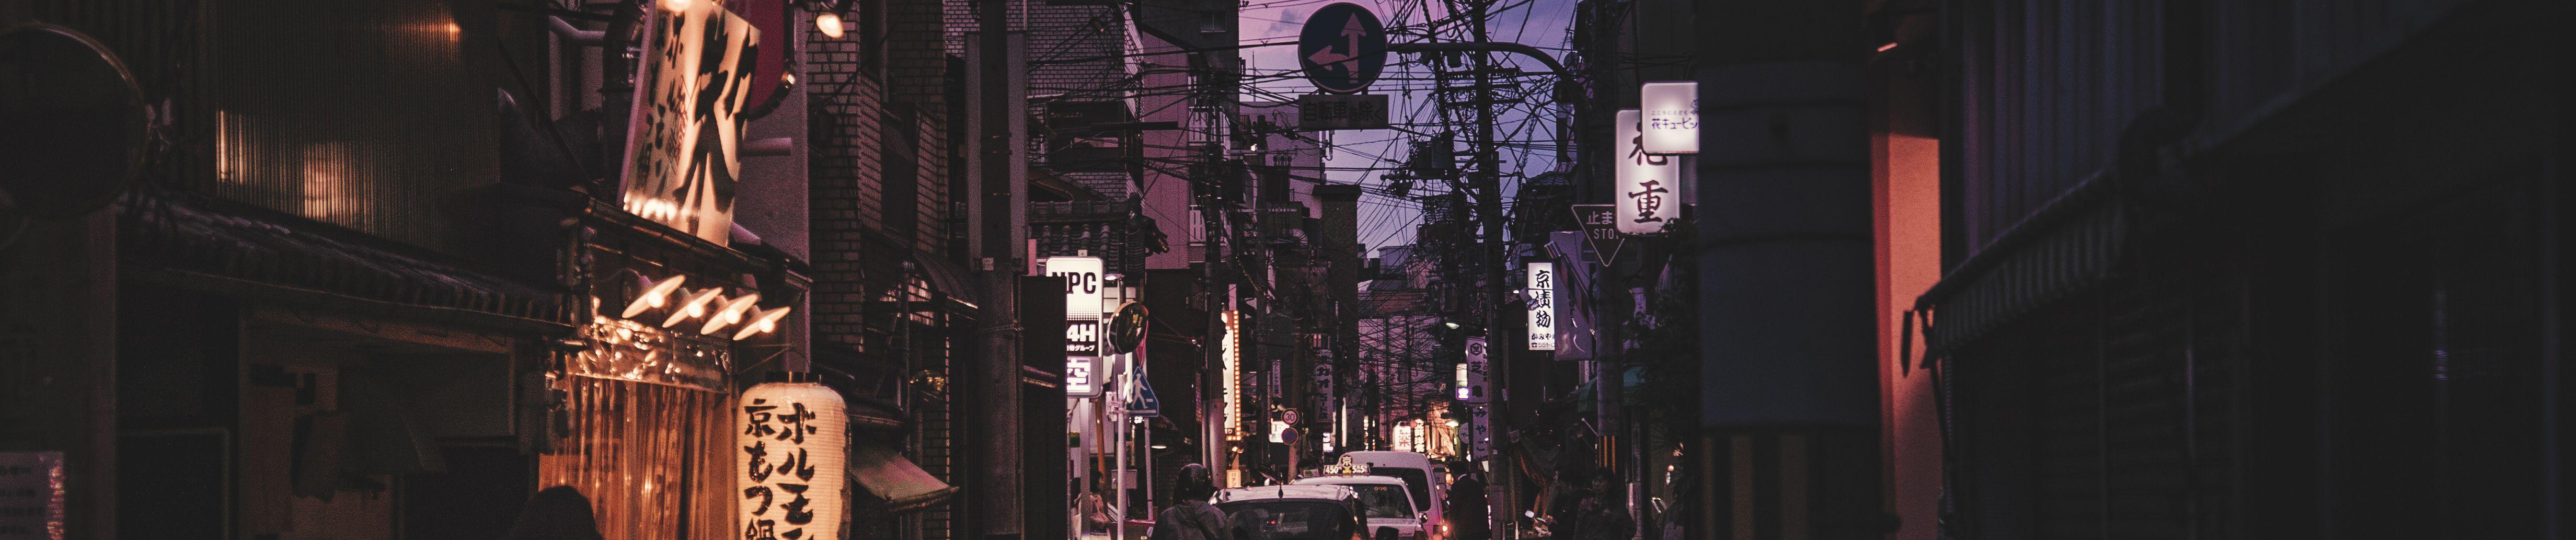 Doppio's ring noise [Lofi] by Seventh Sage   Free Listening